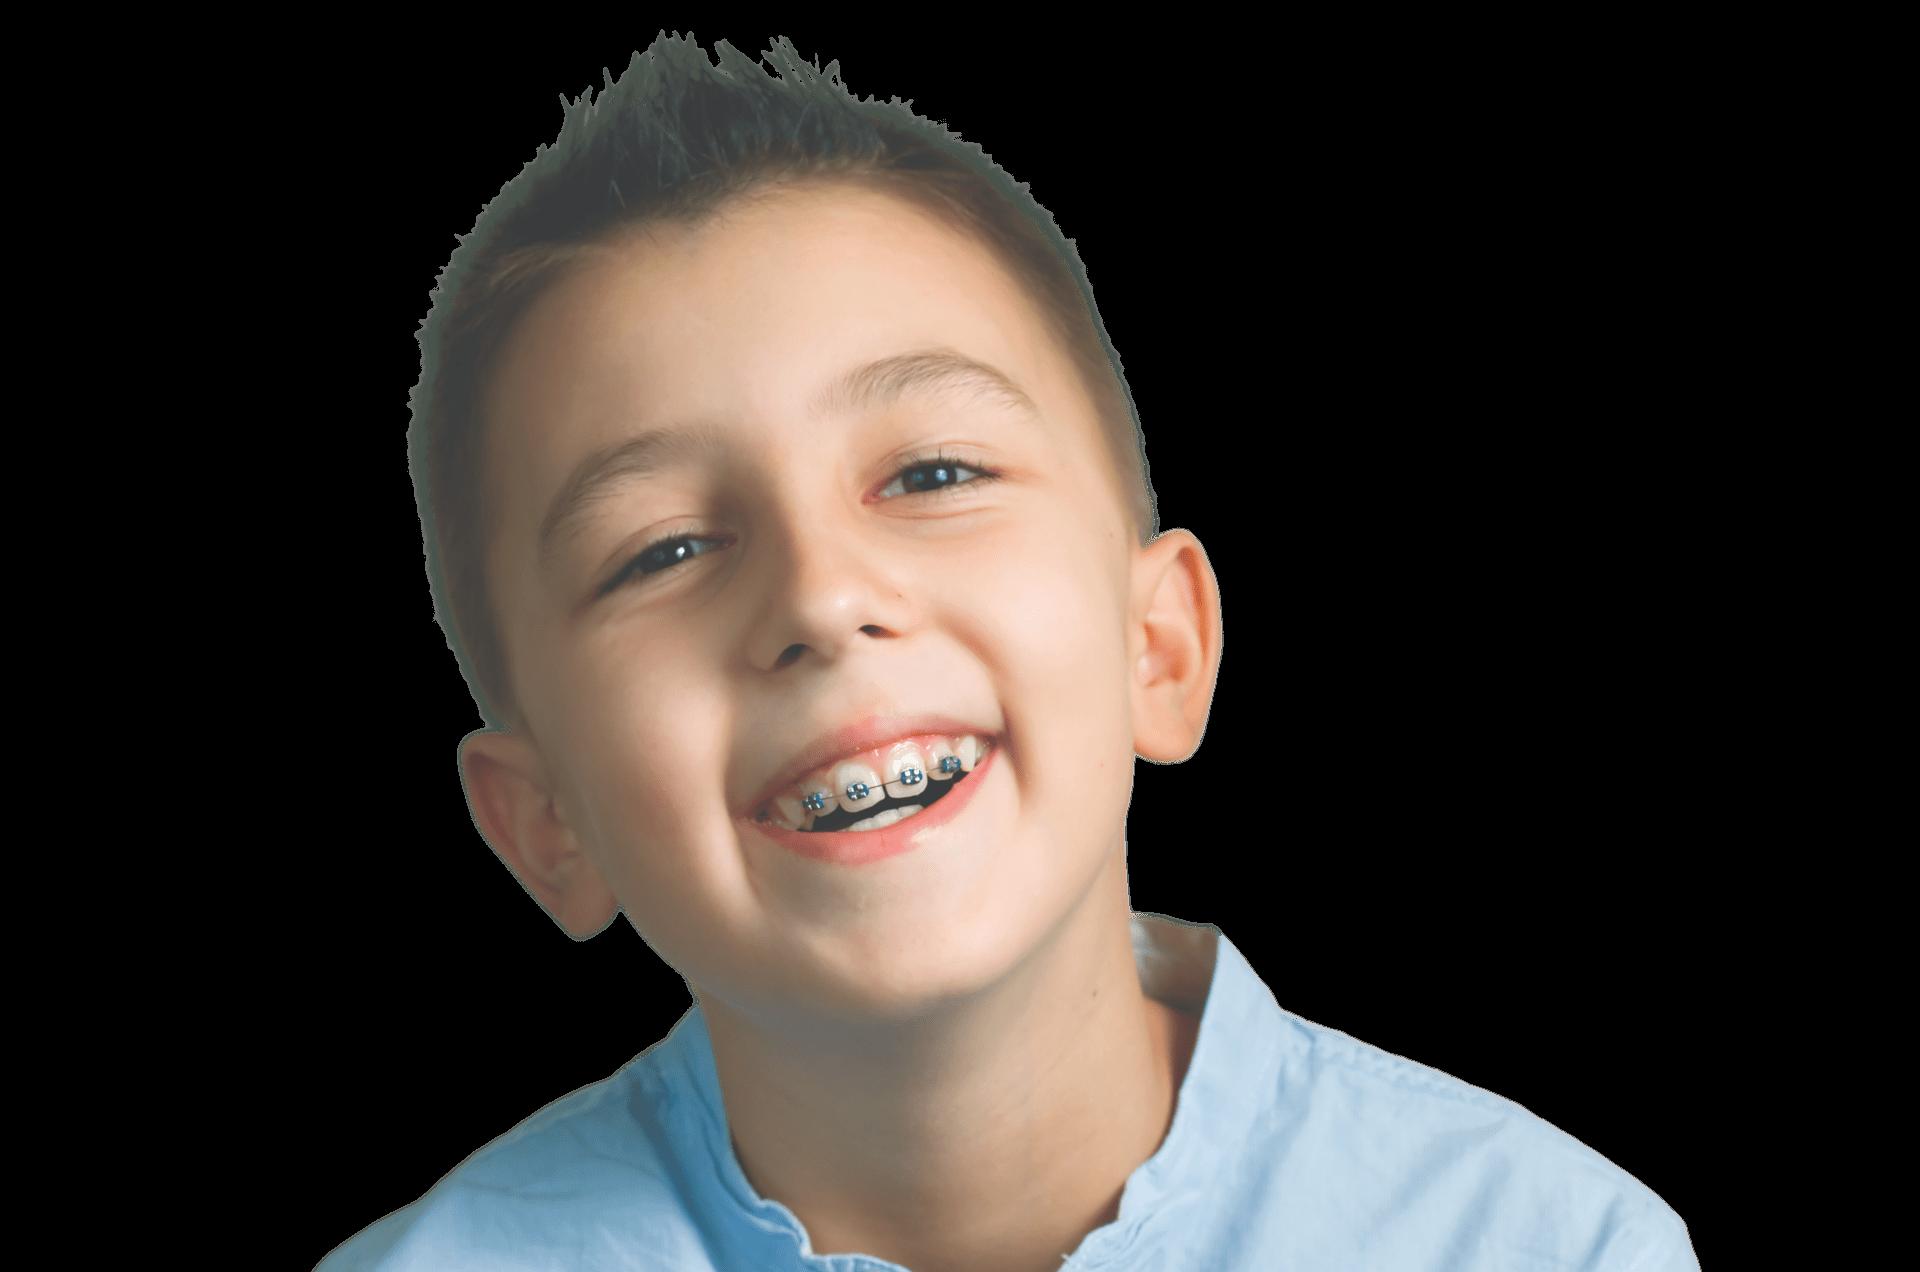 Детско-ортодонтско-лечение-кв-Хладилника-София-Брекети-Деца-Дентална-Клиника-Impression-Dent